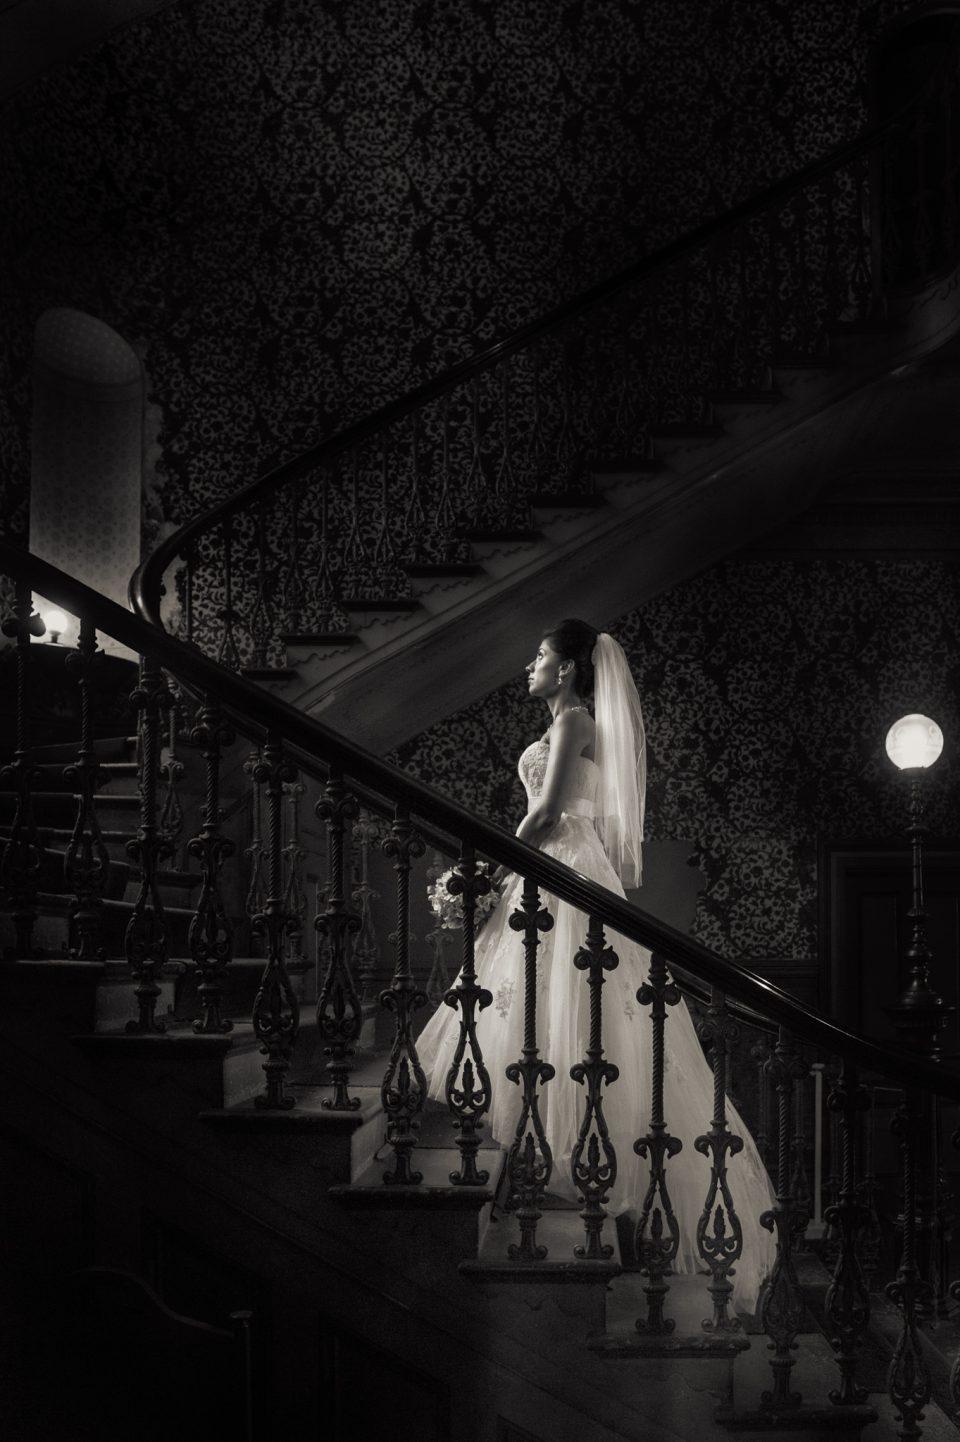 Bride walks up grand stair case at Labassa mansion towards light